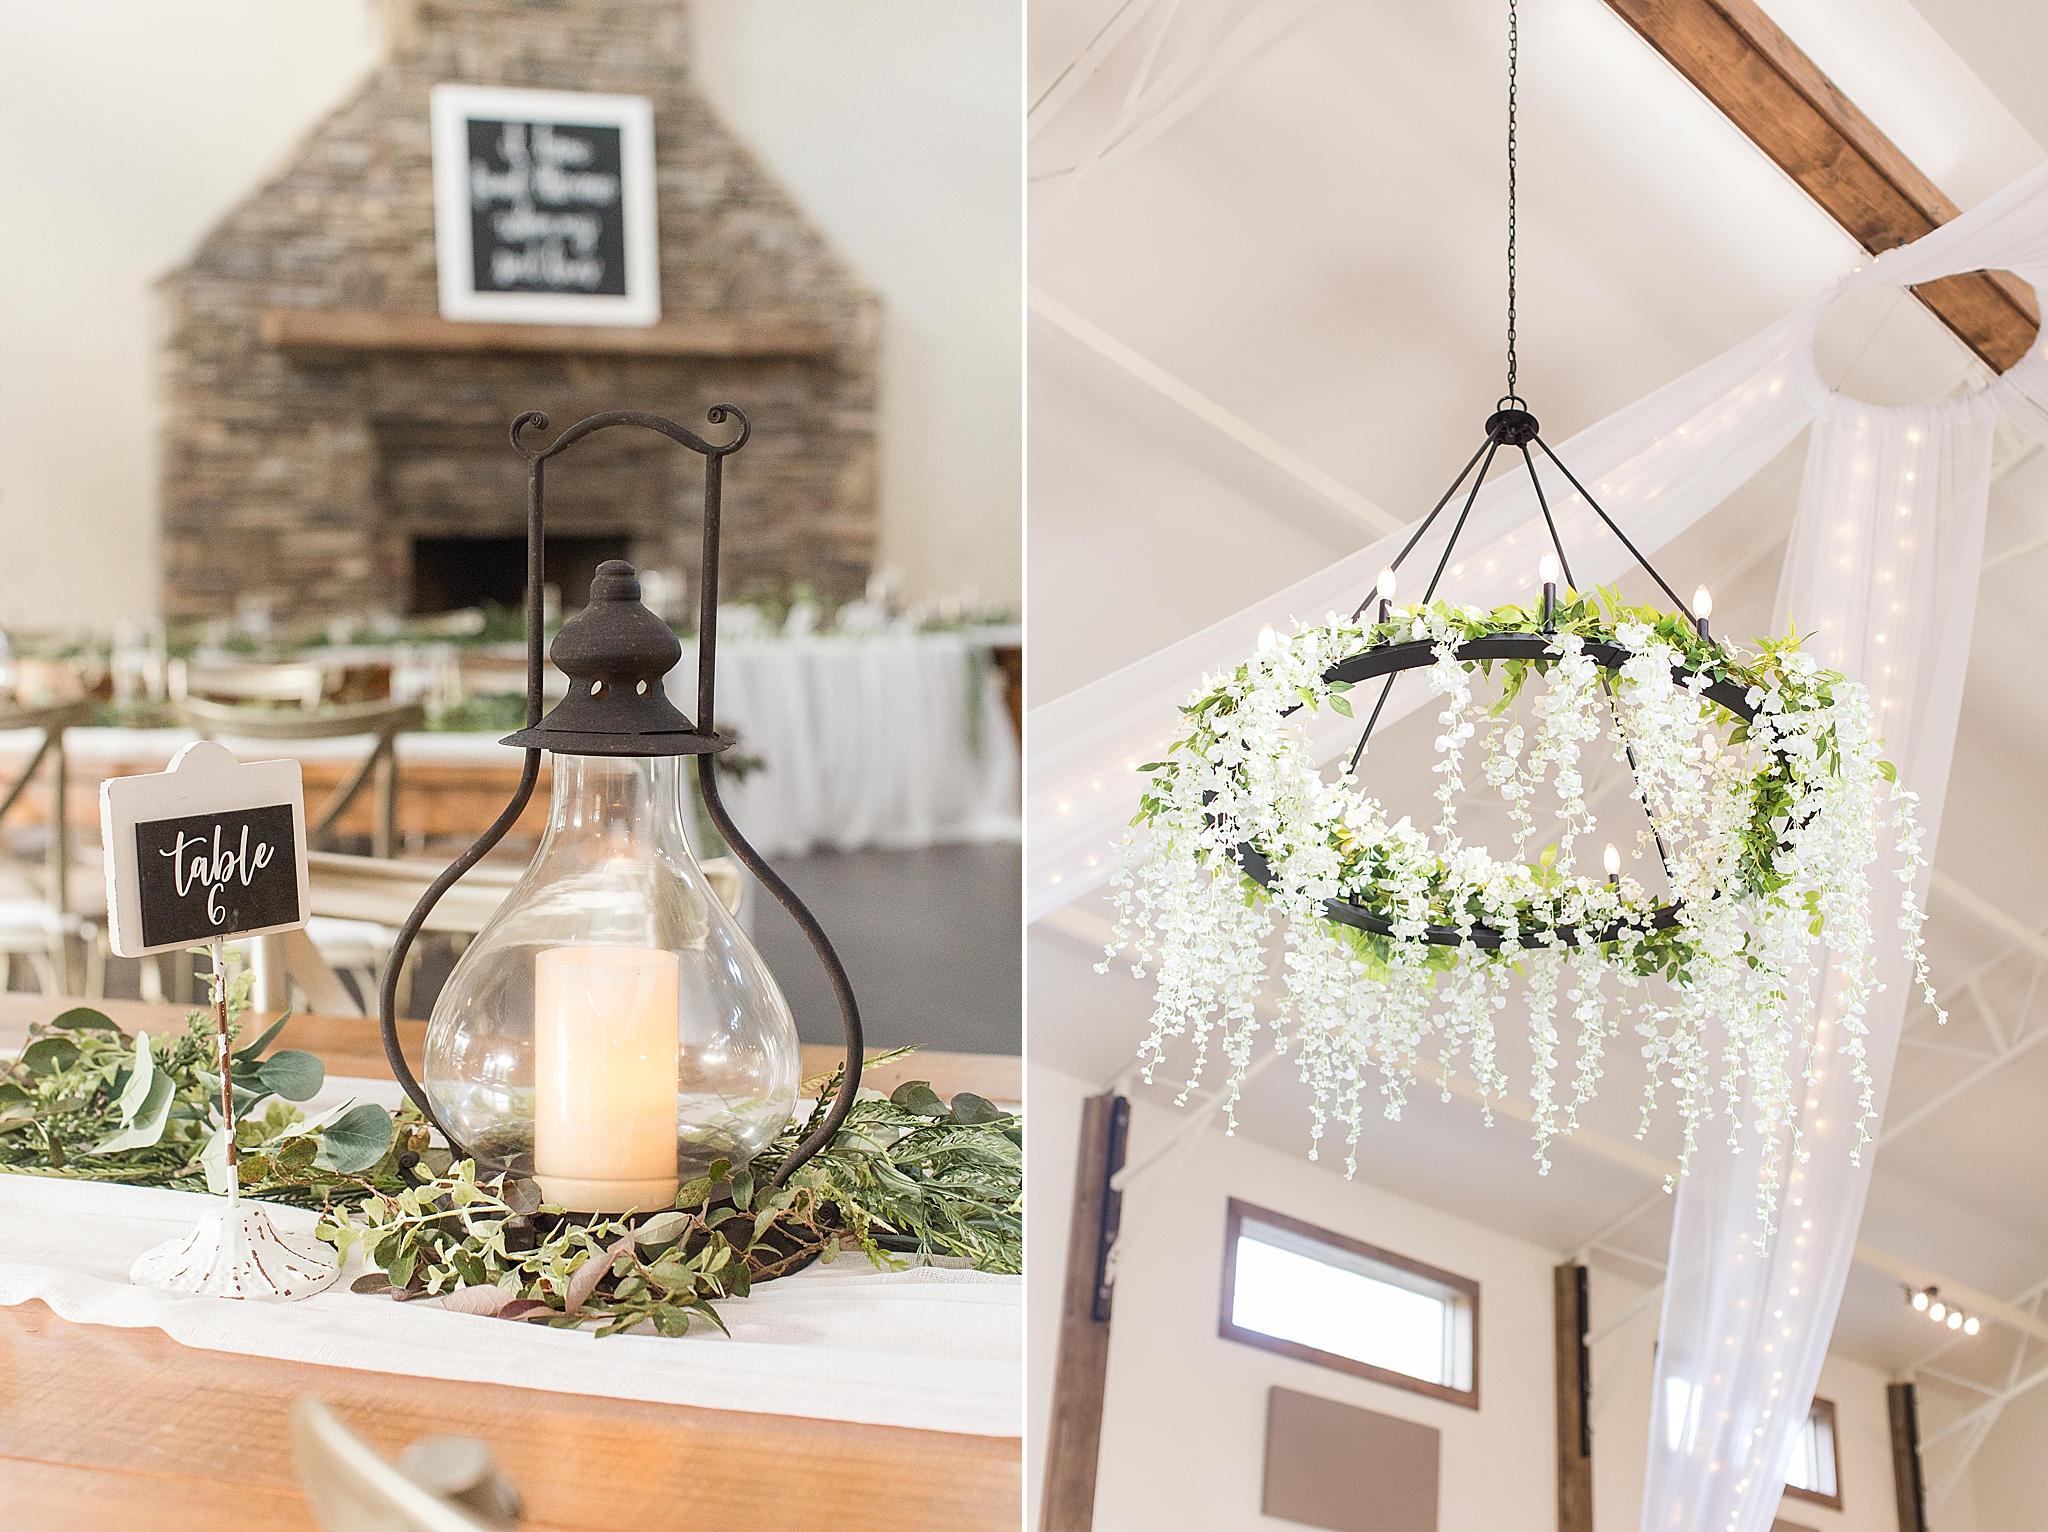 details for Izenstone wedding reception